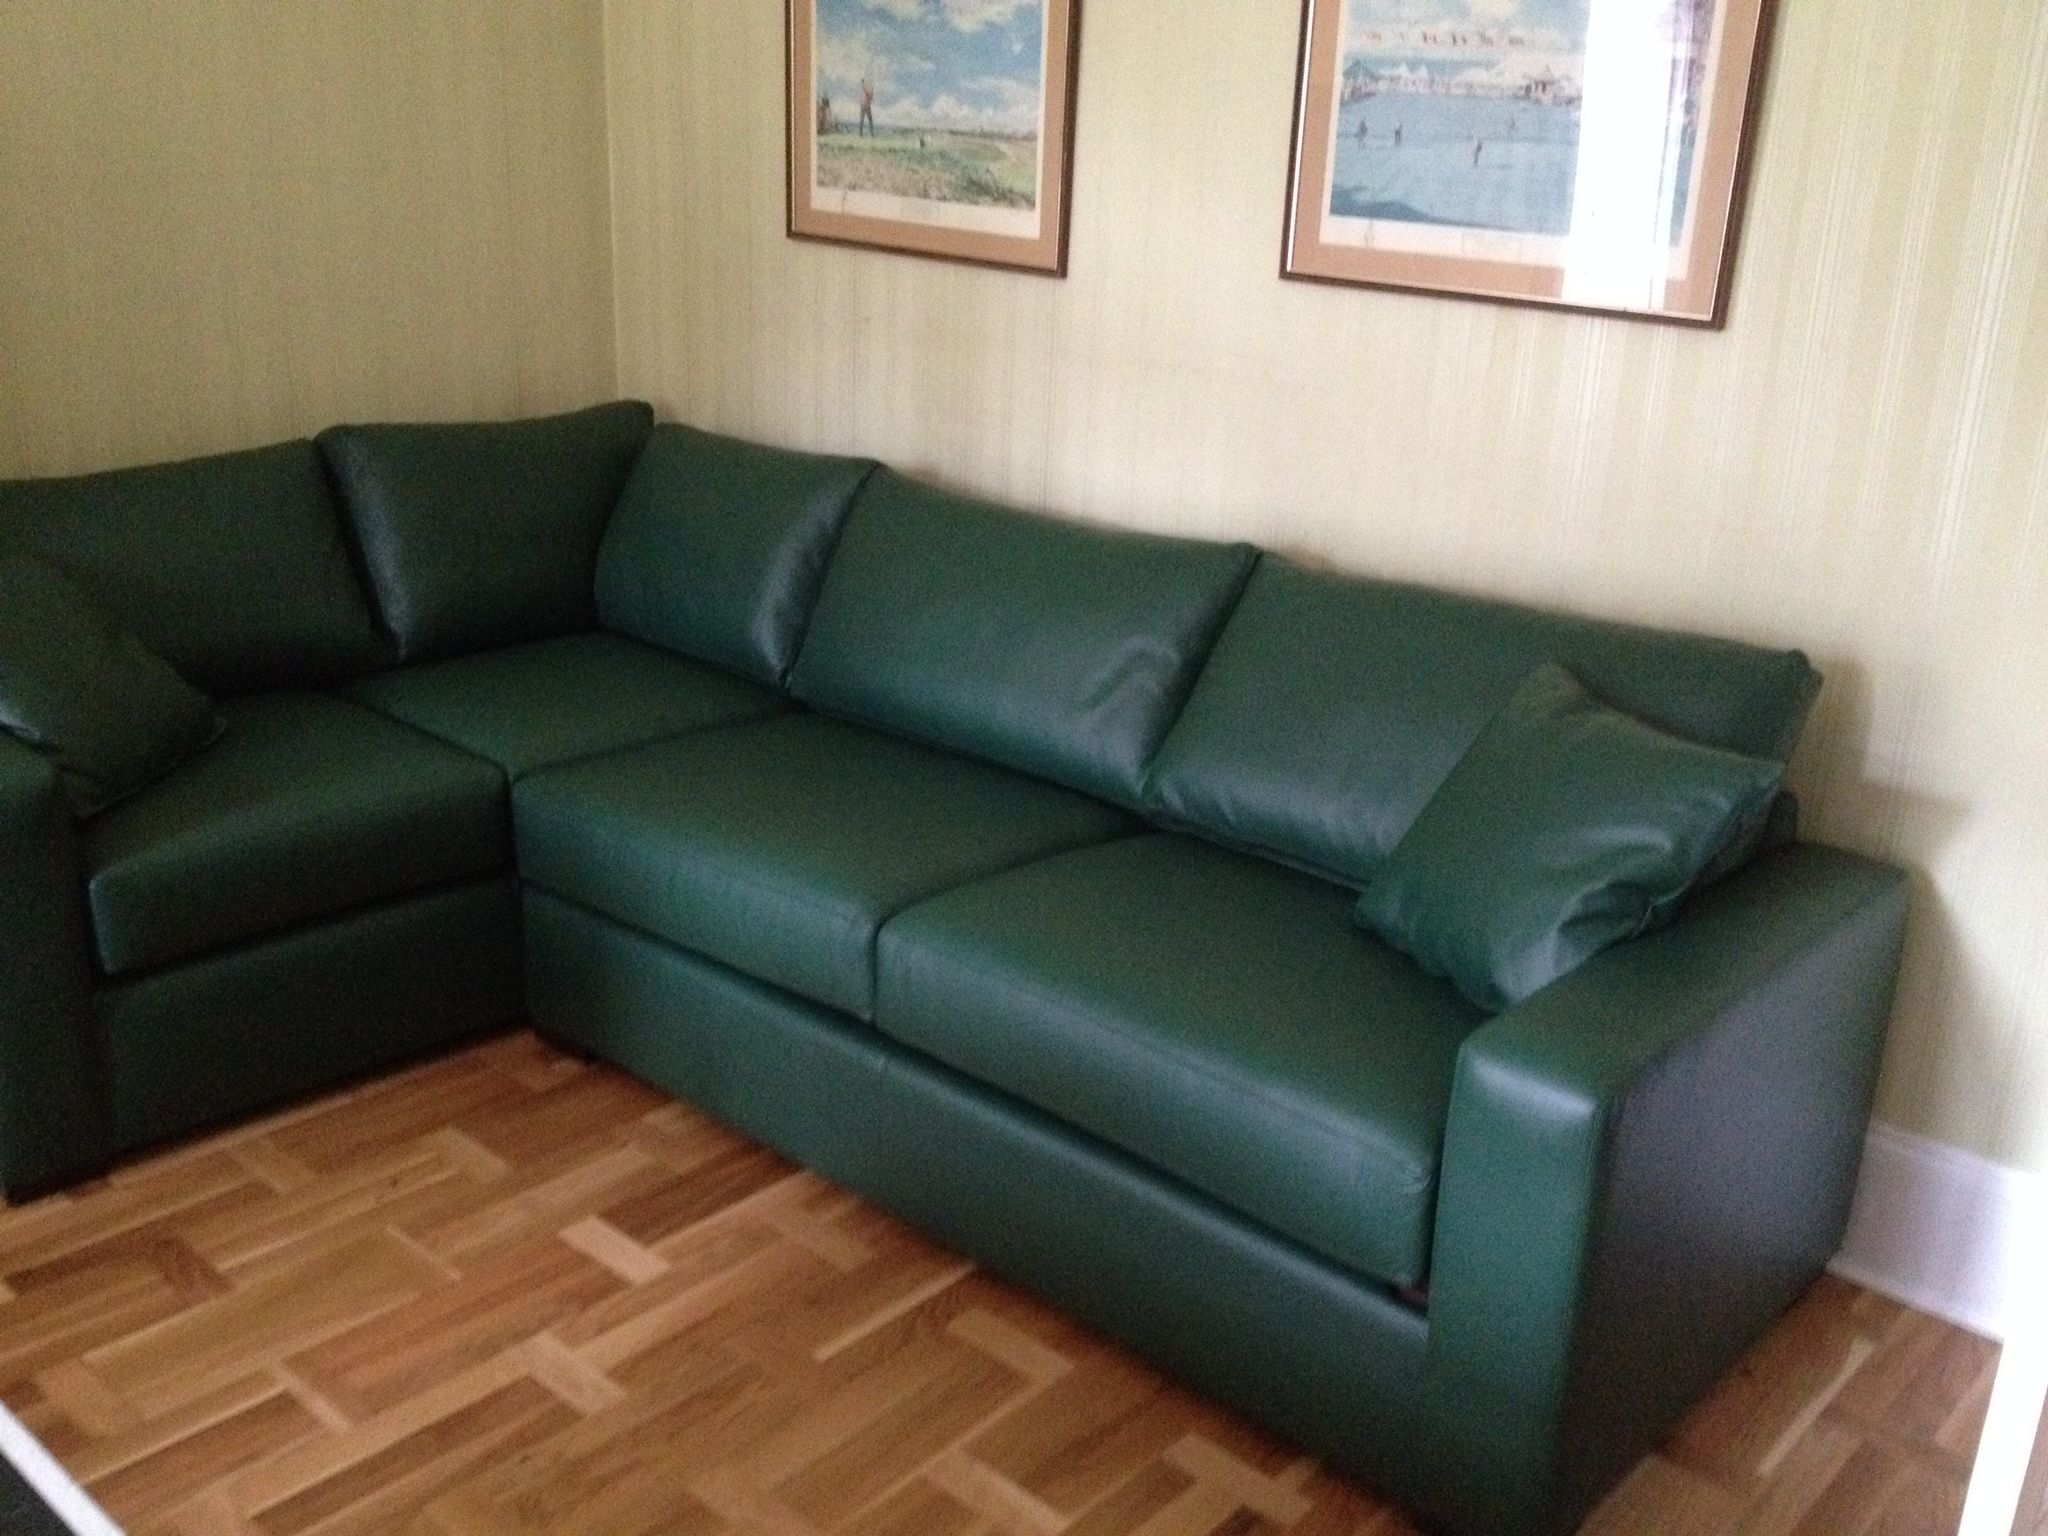 Leather sofas nottingham refil sofa for Furniture nottingham